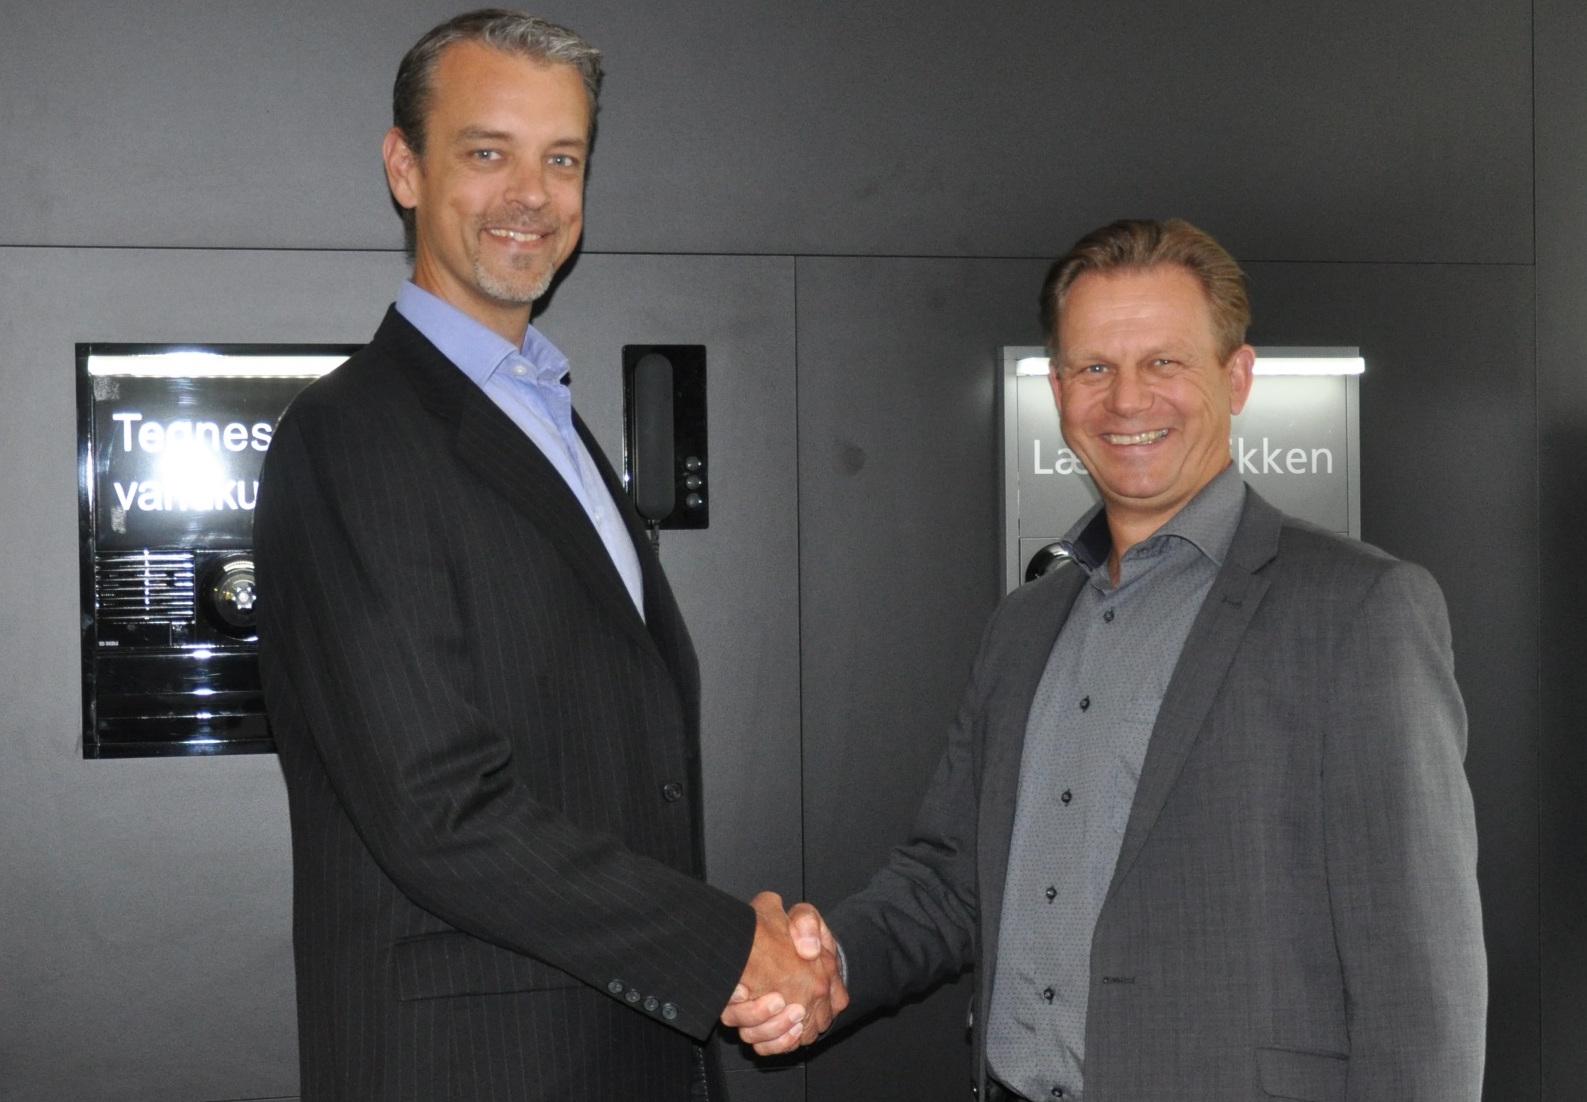 N�jda med partnerskapet. Marcus Segerdahl, Business Area Manager f�r Contal Security, och Per Thomsen, vd f�r Siedle Nordic.